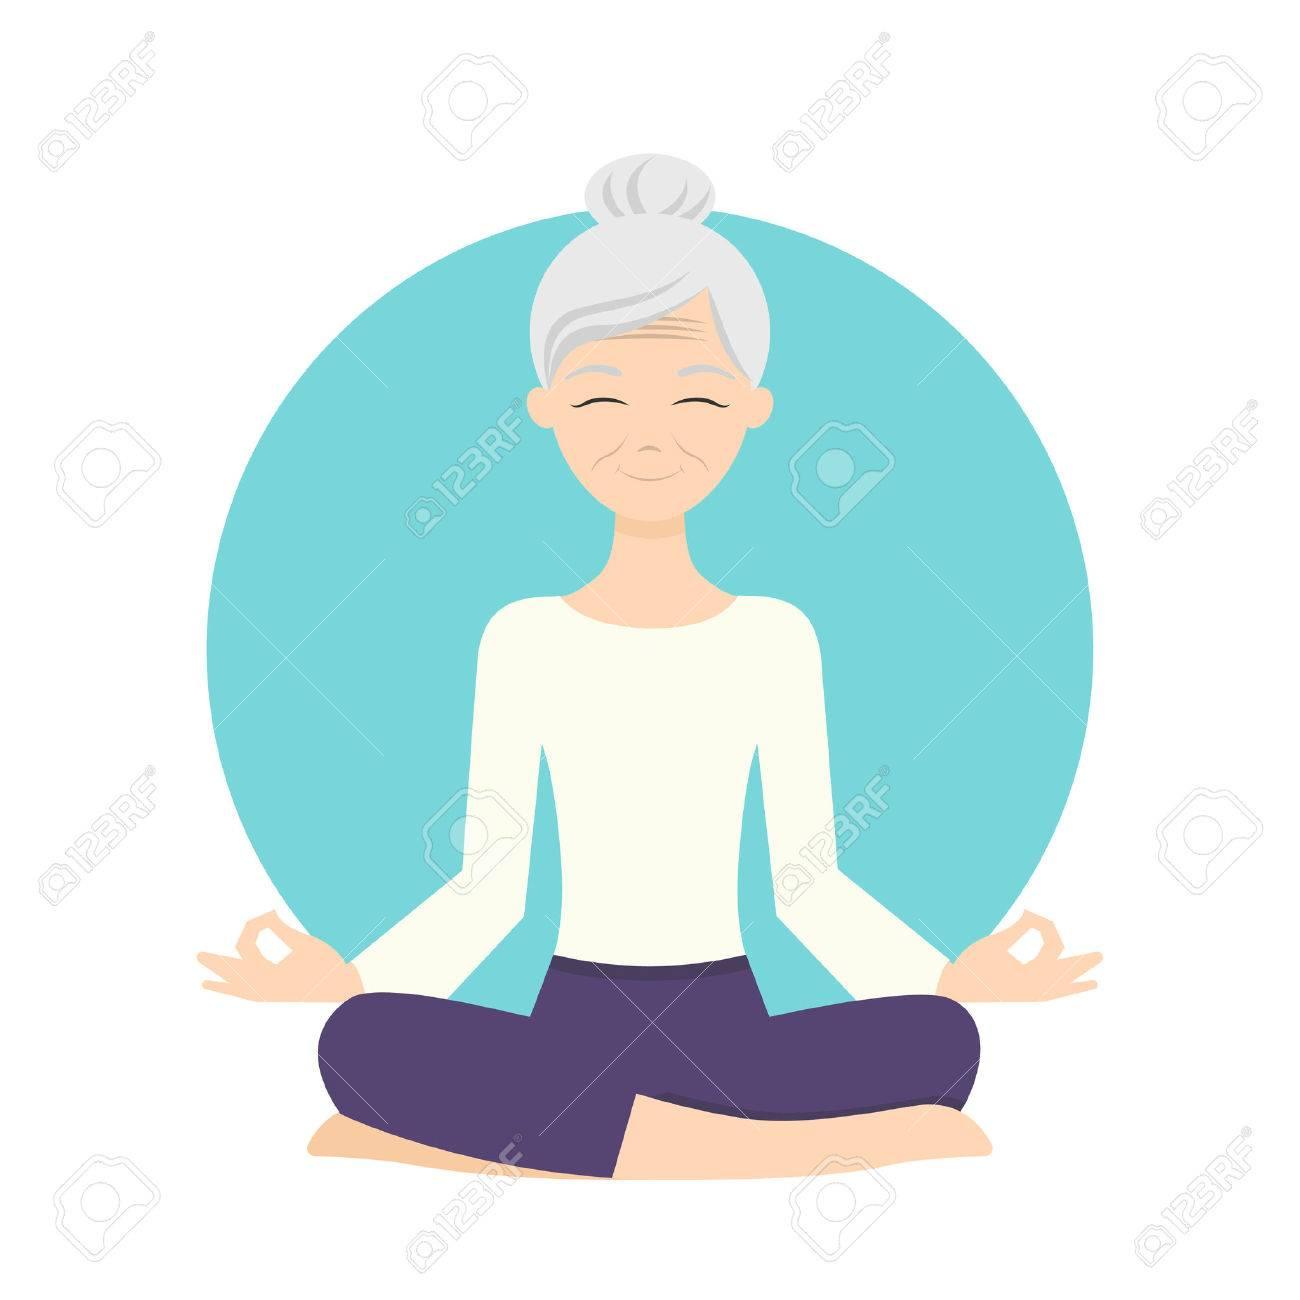 Illustration of senior woman practicing yoga exercises. Healthy lifestyle. - 51737527